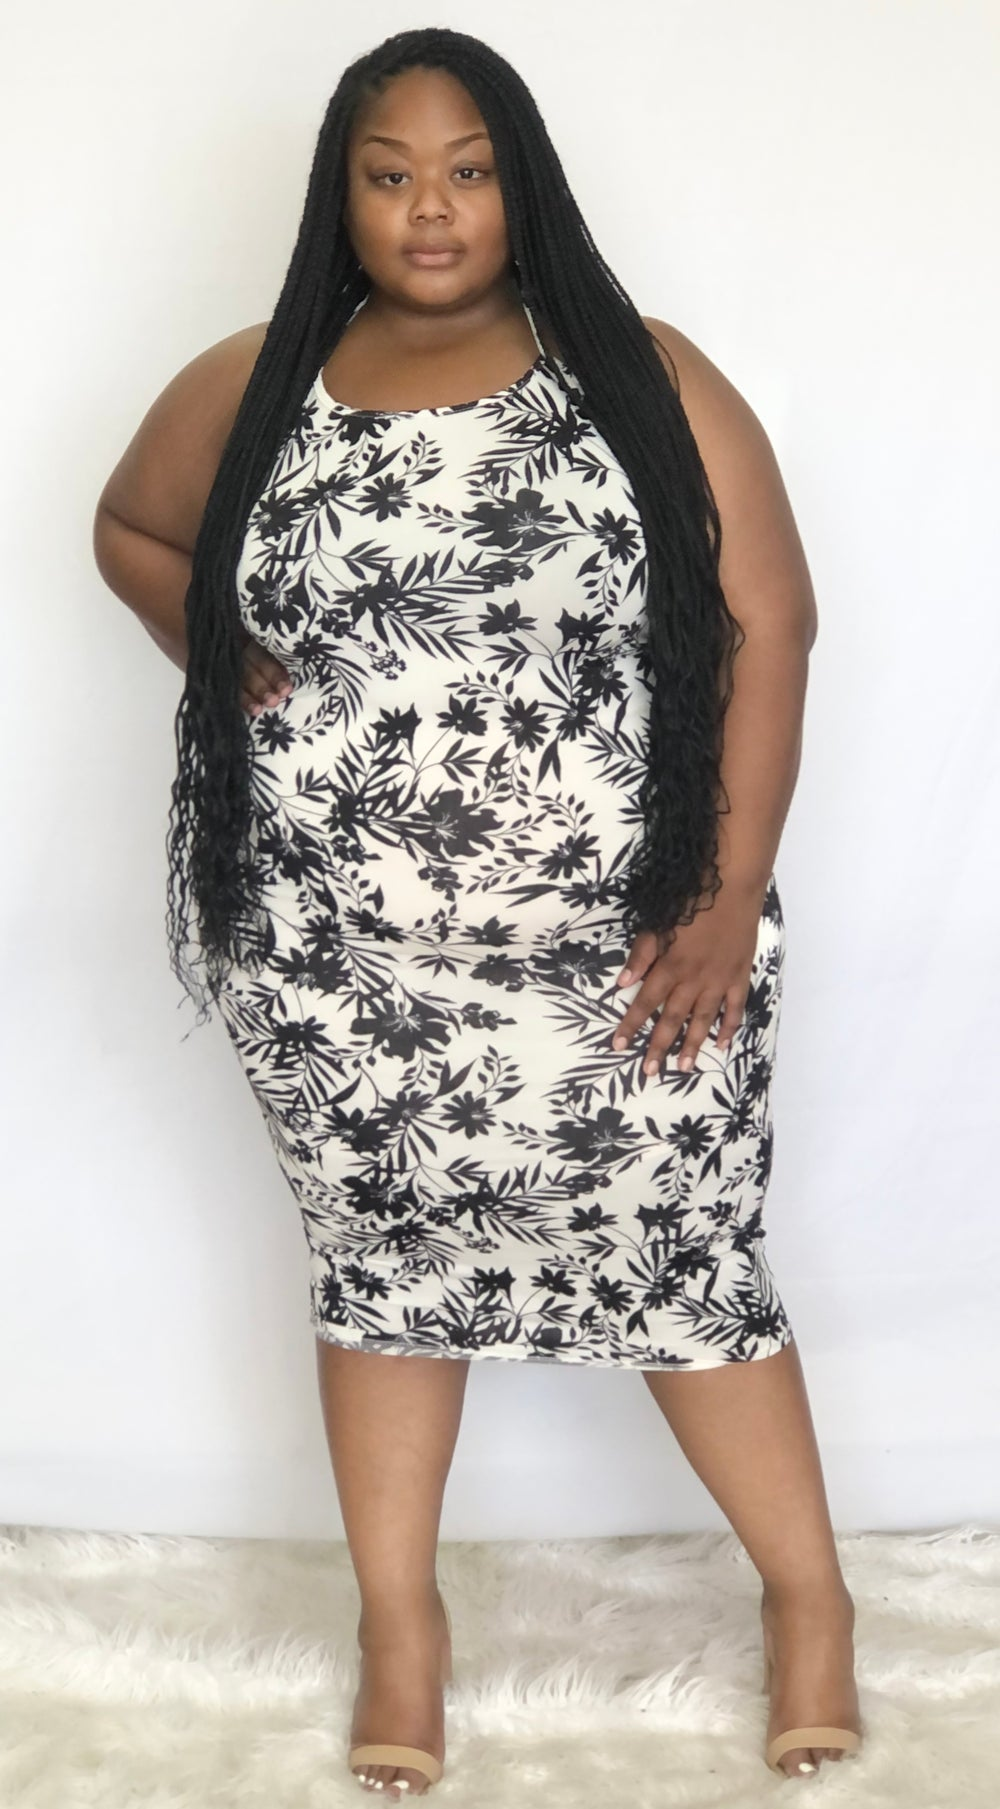 Image of BLACK FLORAL  PLUS SIZE SPAGHETTI STRAP BODYCON DRESS